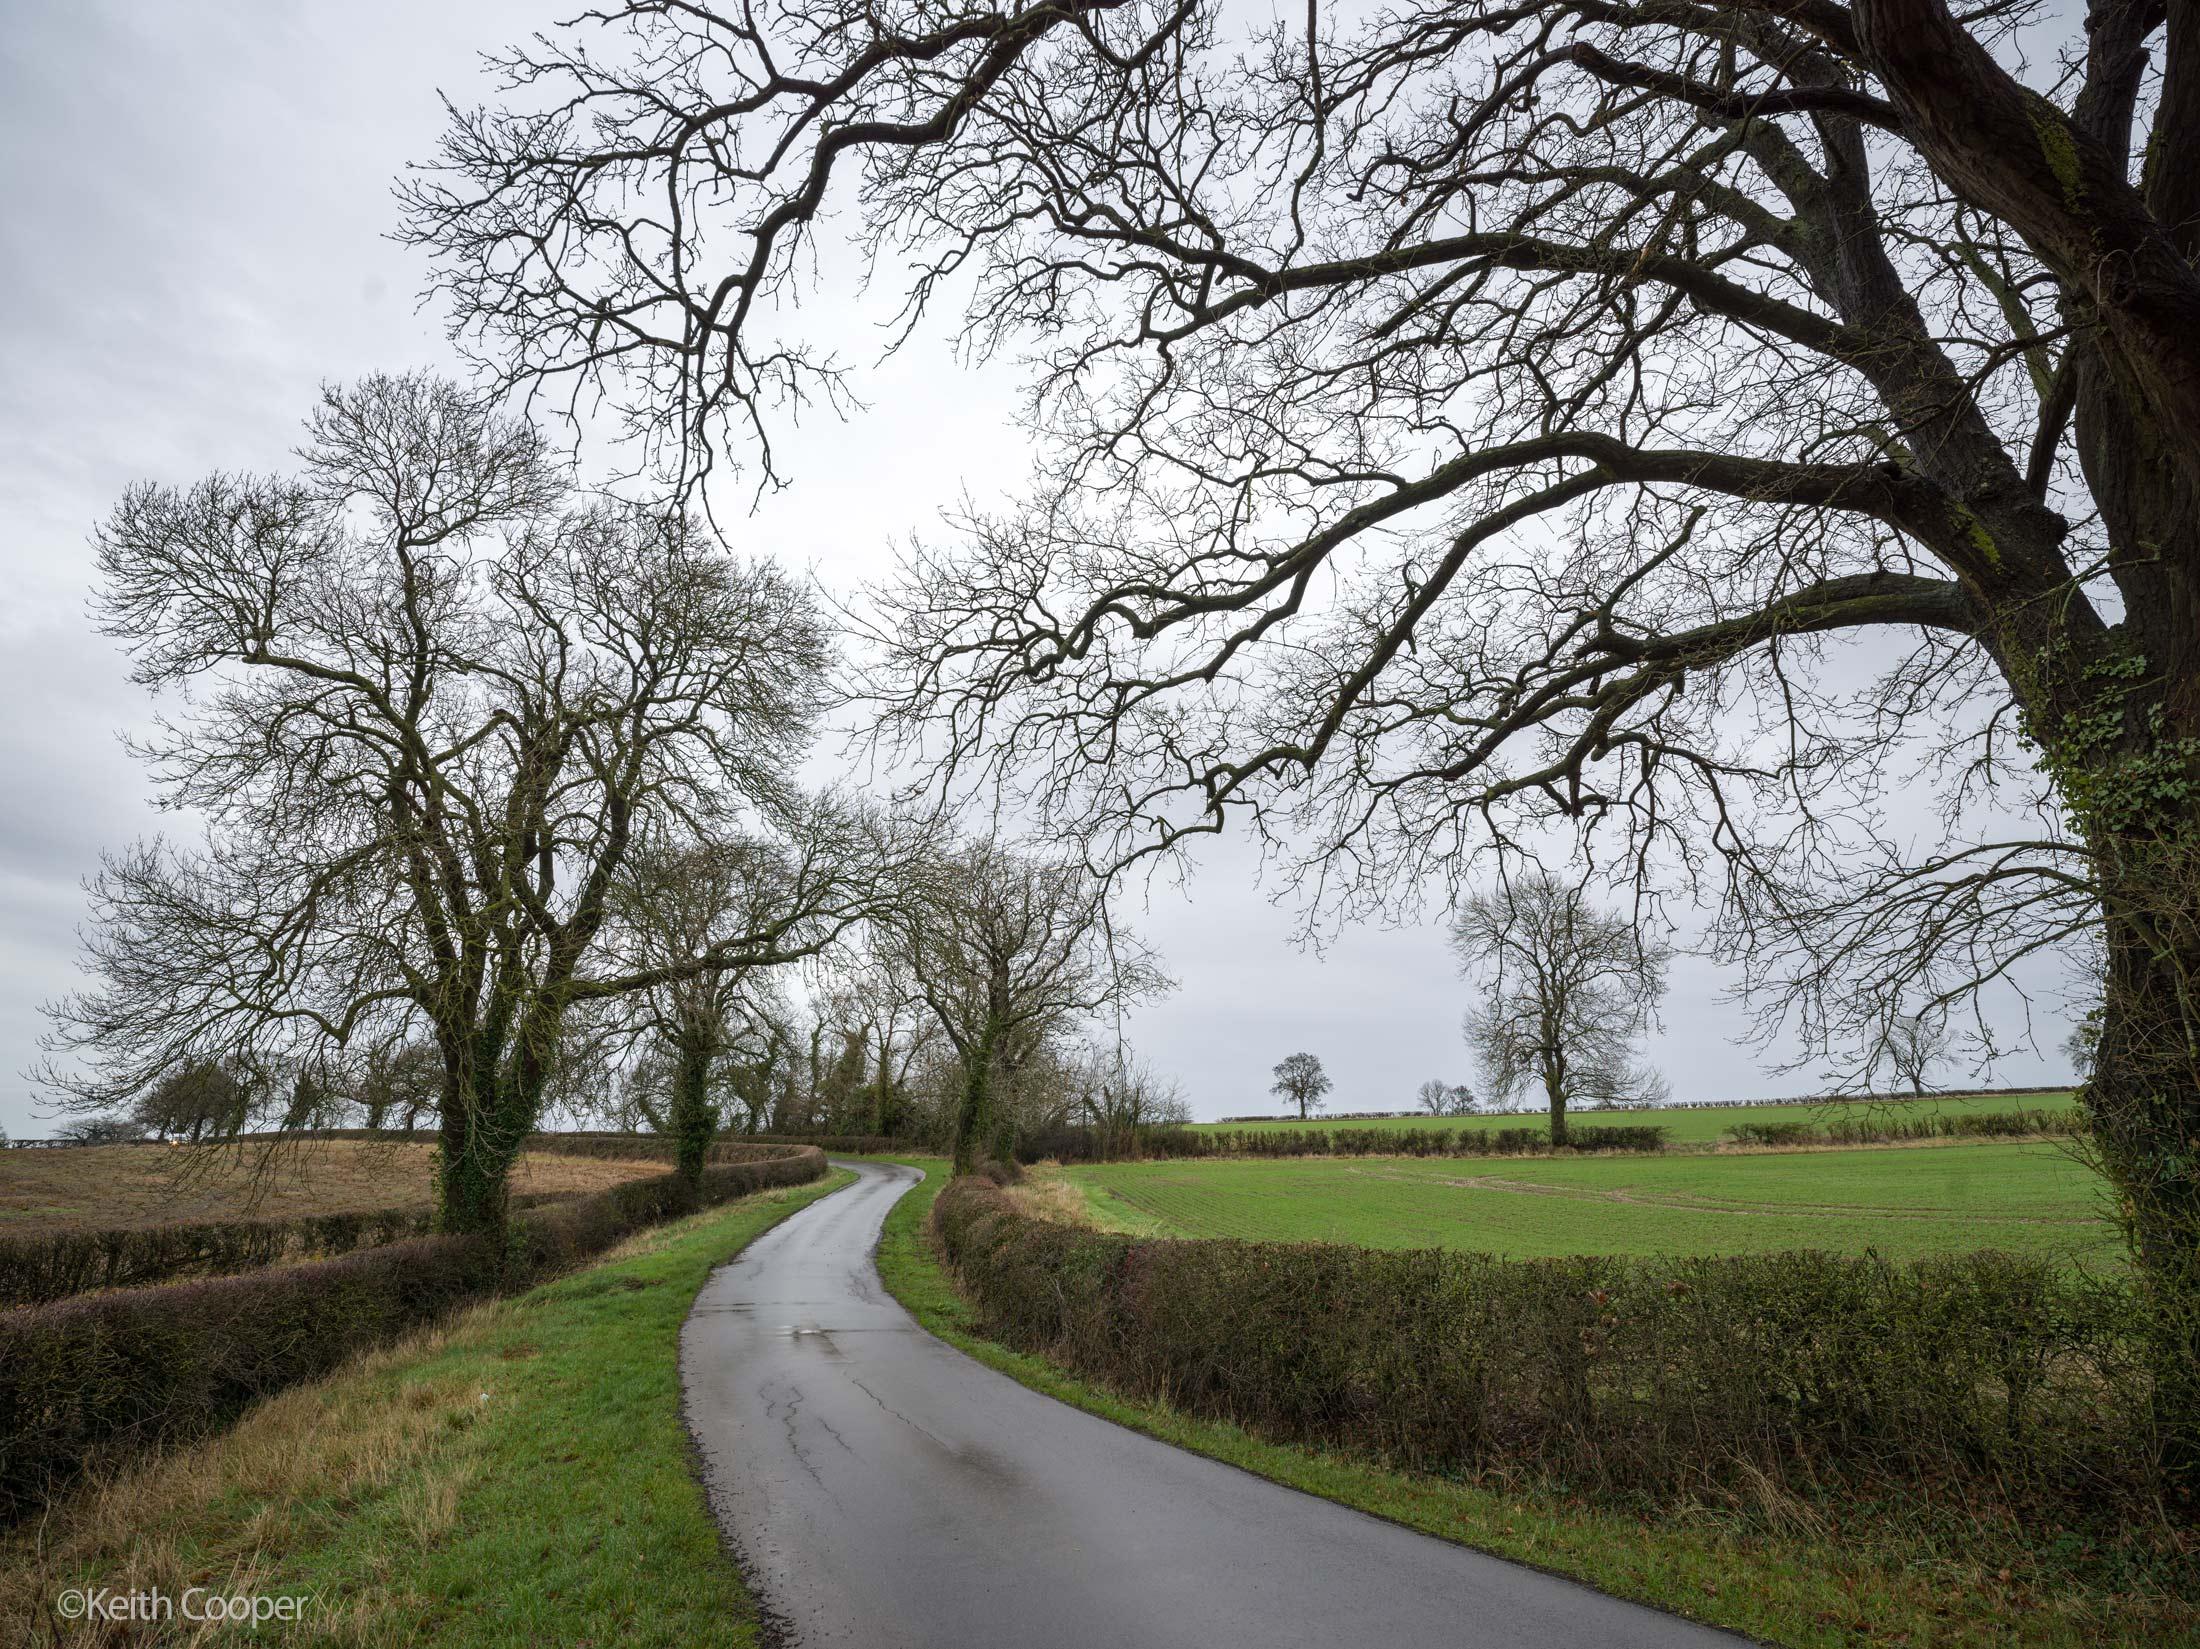 damp trees